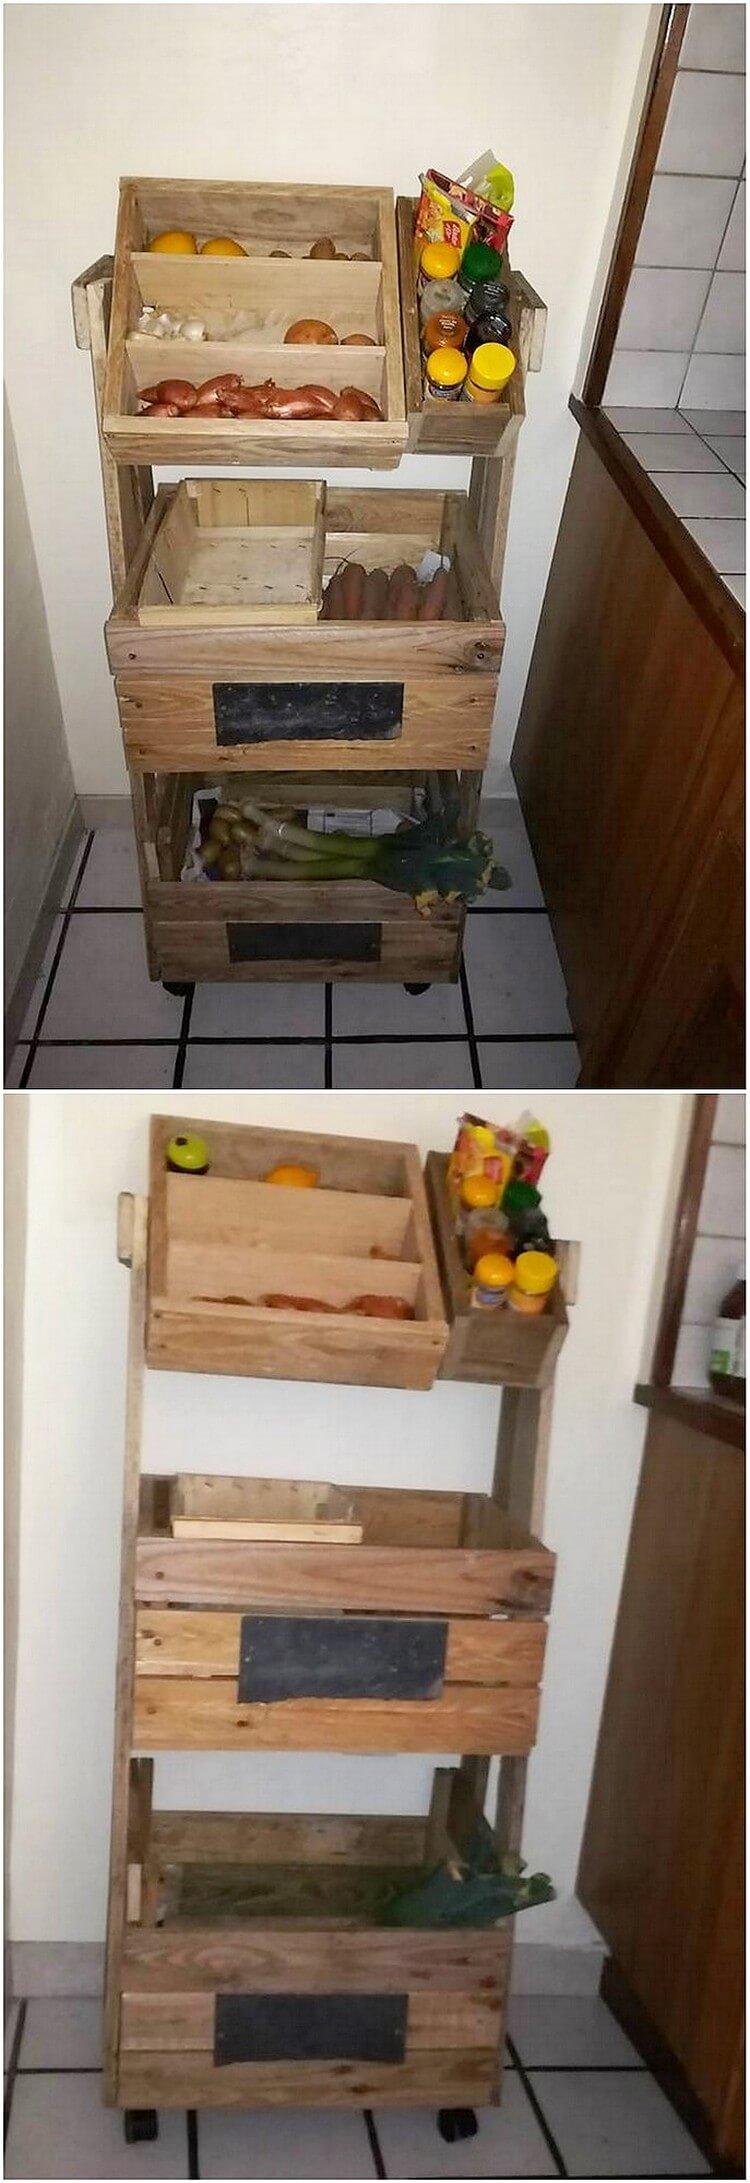 Pallet Vegetable and Fruit Rack